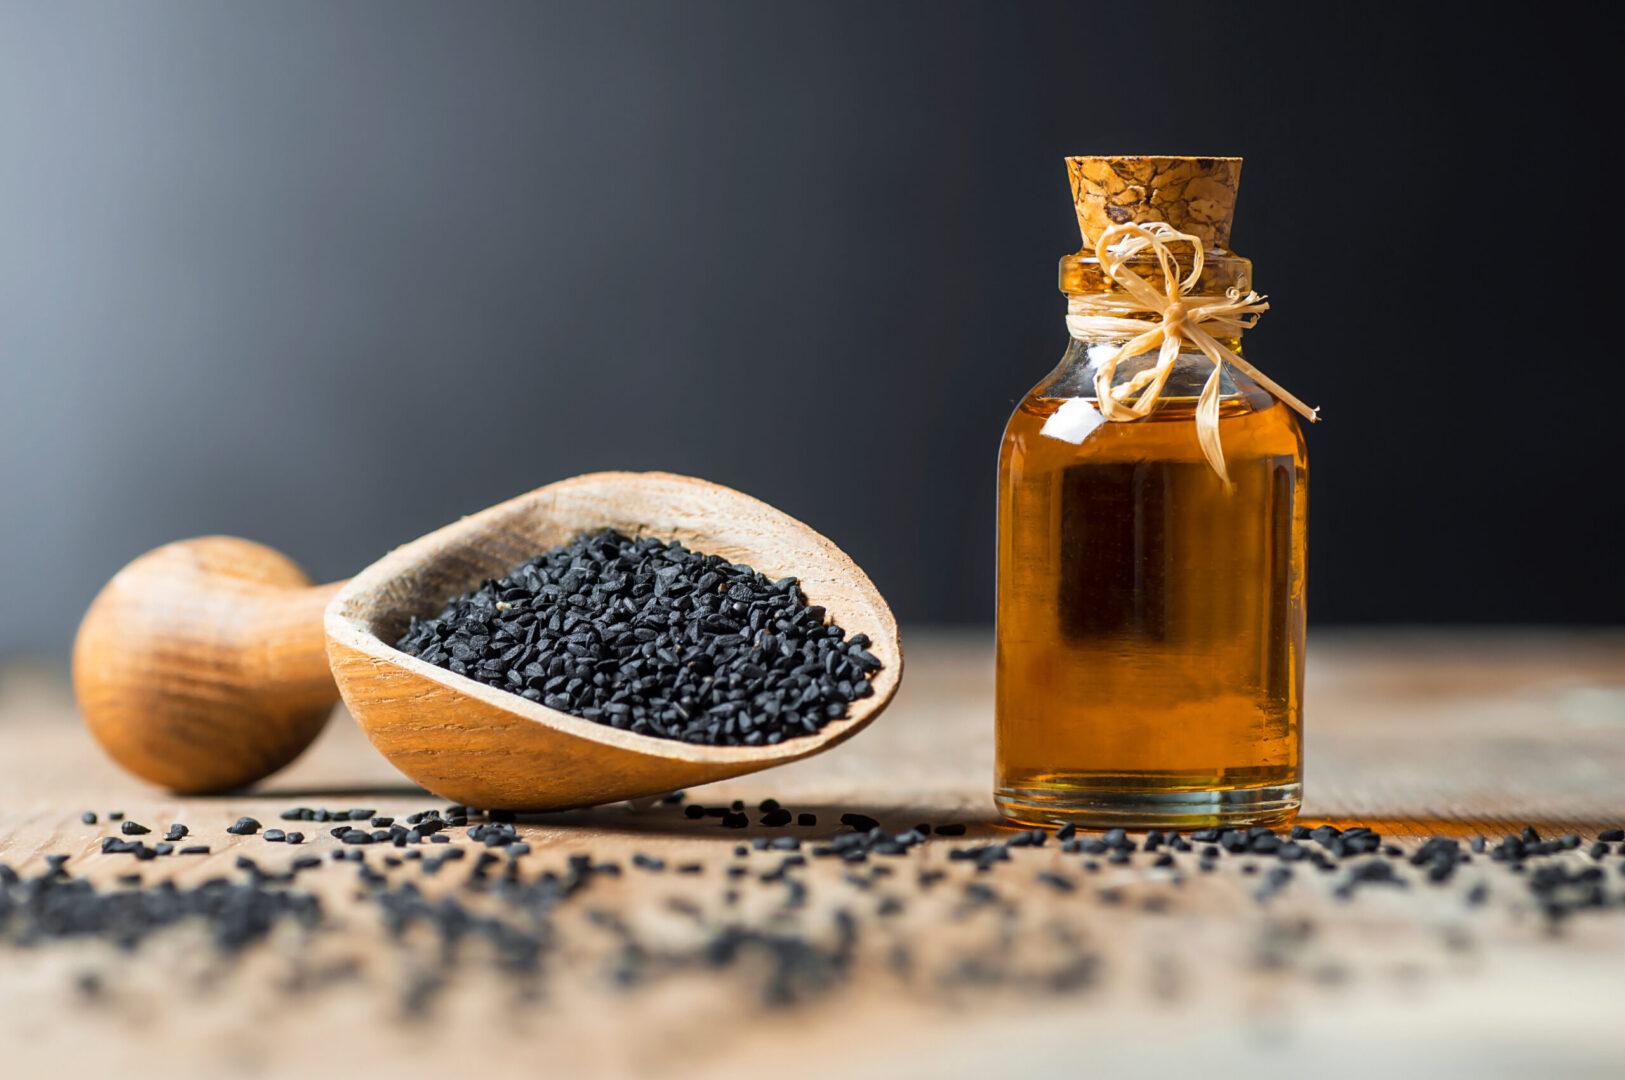 Neu in unserem Sortiment: Vitalöle und Vitalgewürze der Ölmühle Solling